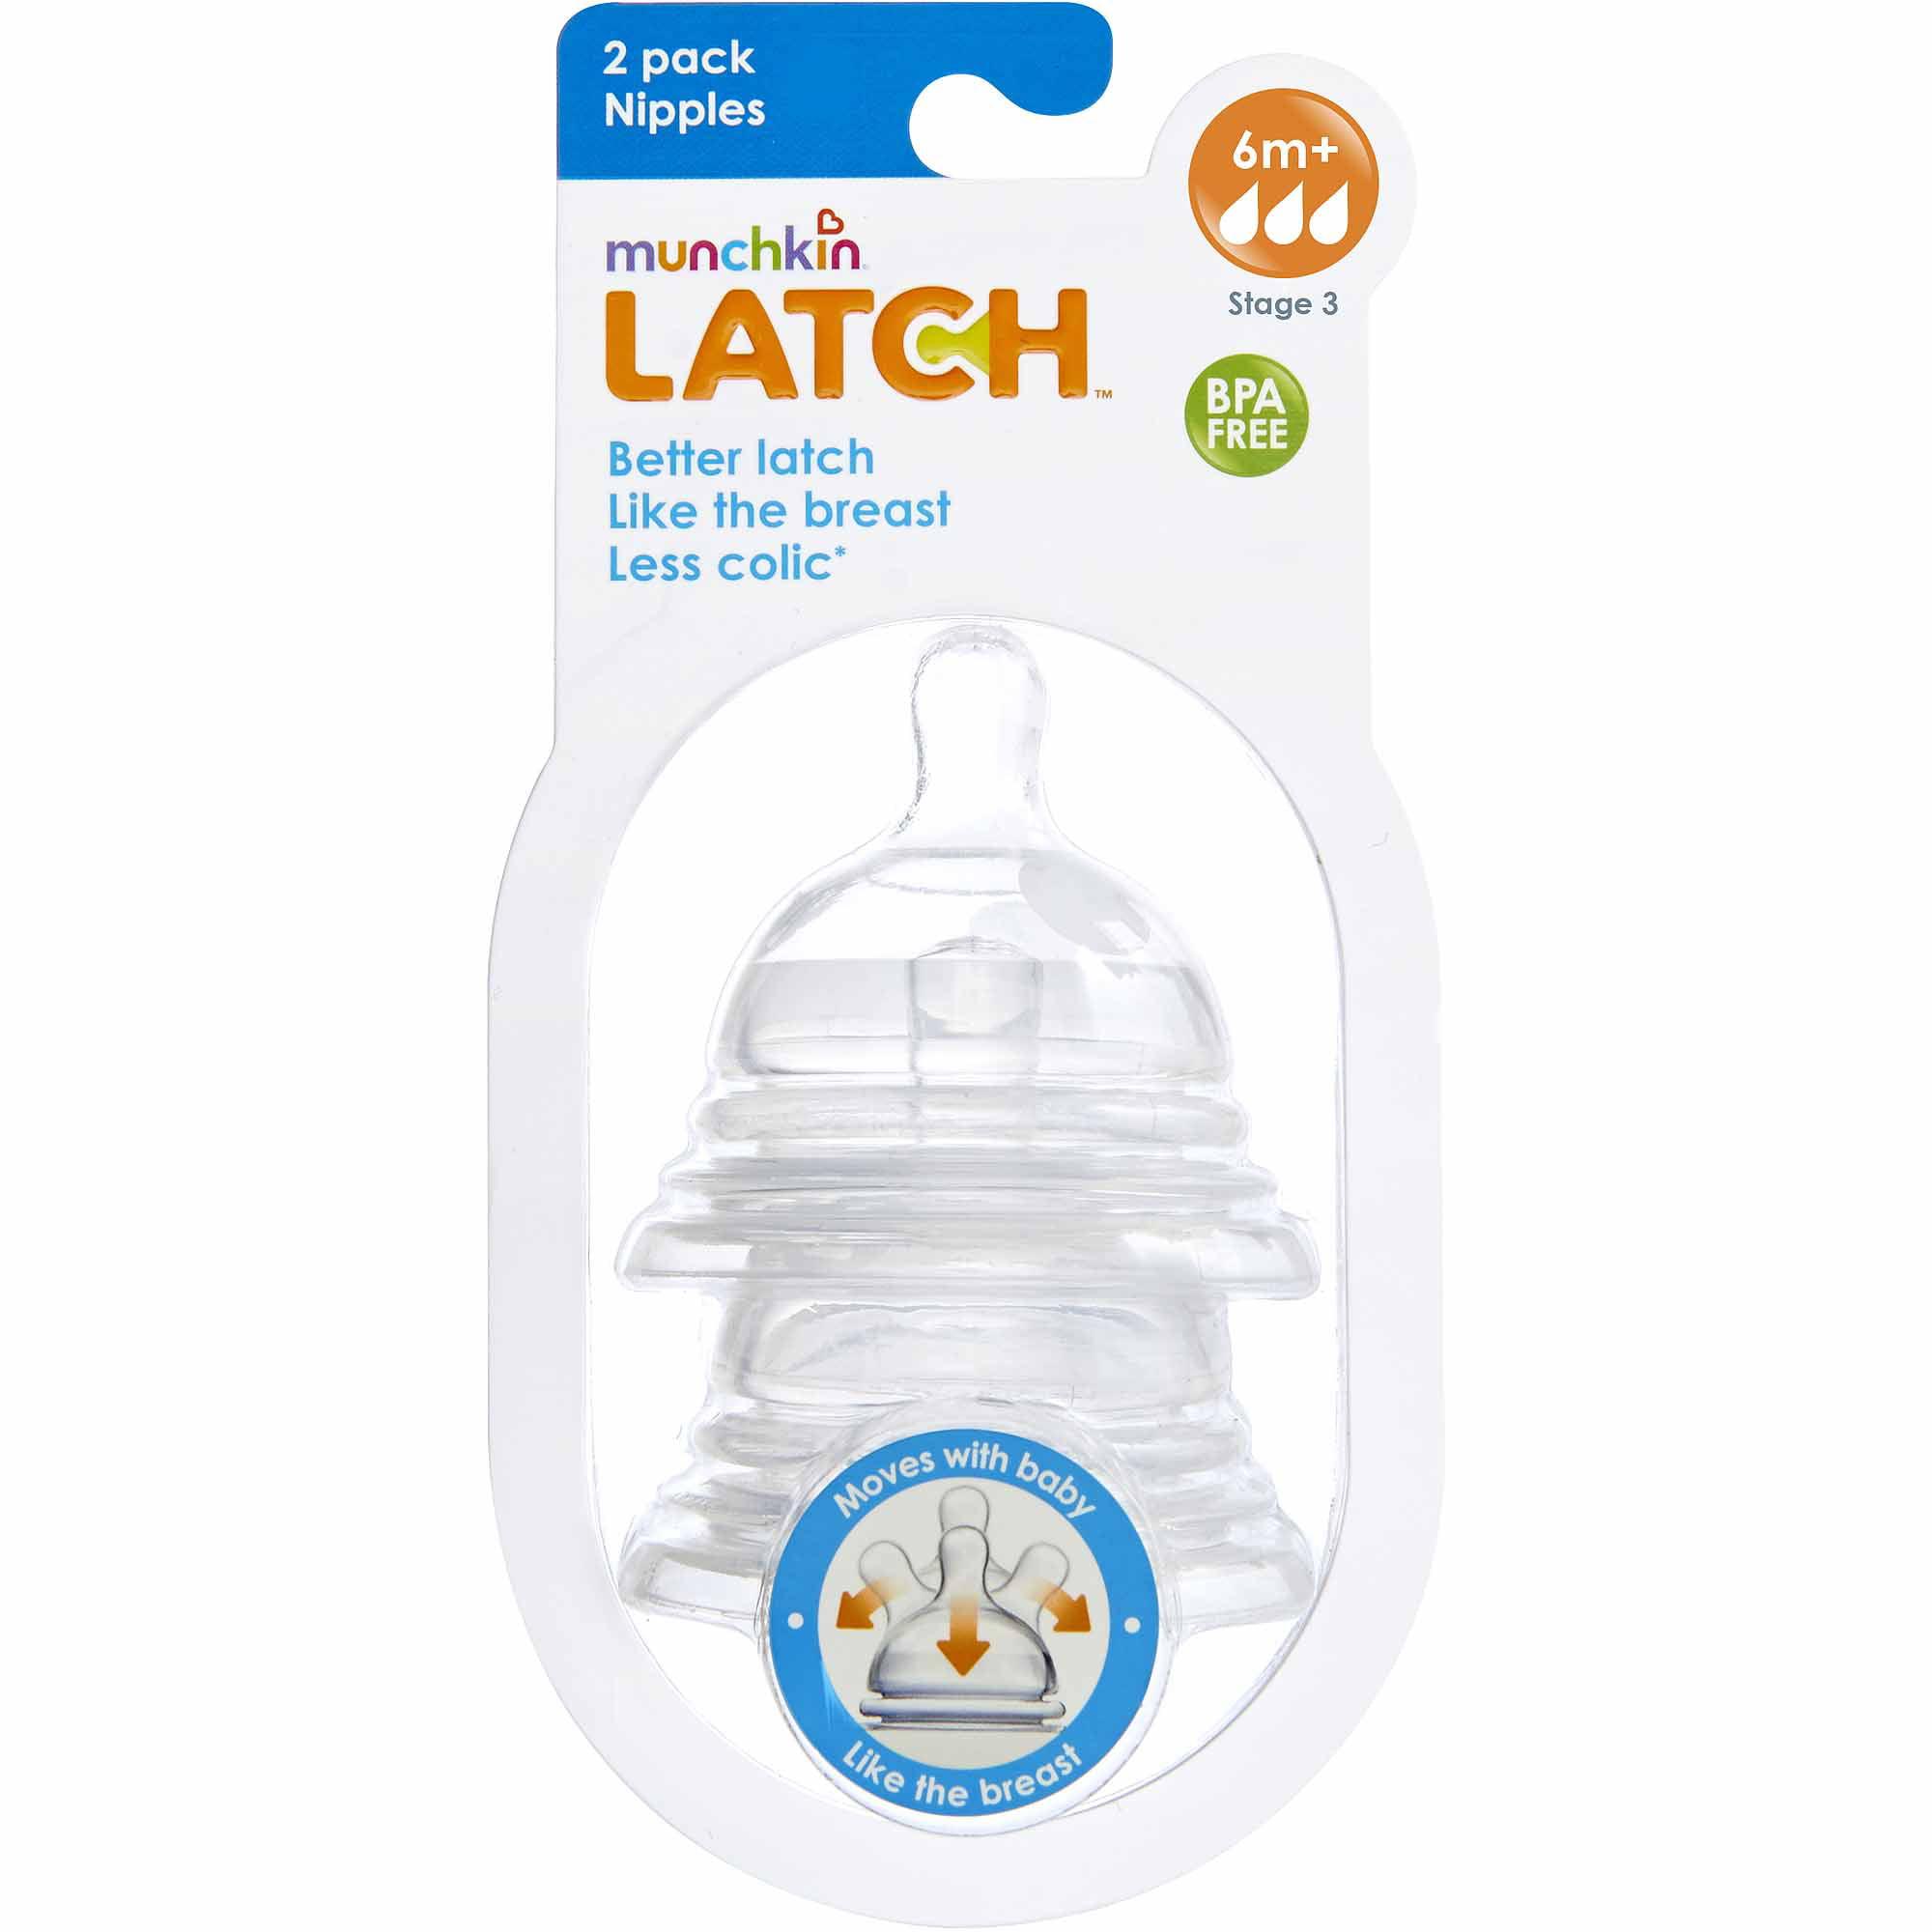 Munchkin LATCH Stage 3 Nipple, BPA-Free, 6+ Months - 2pk - Walmart.com